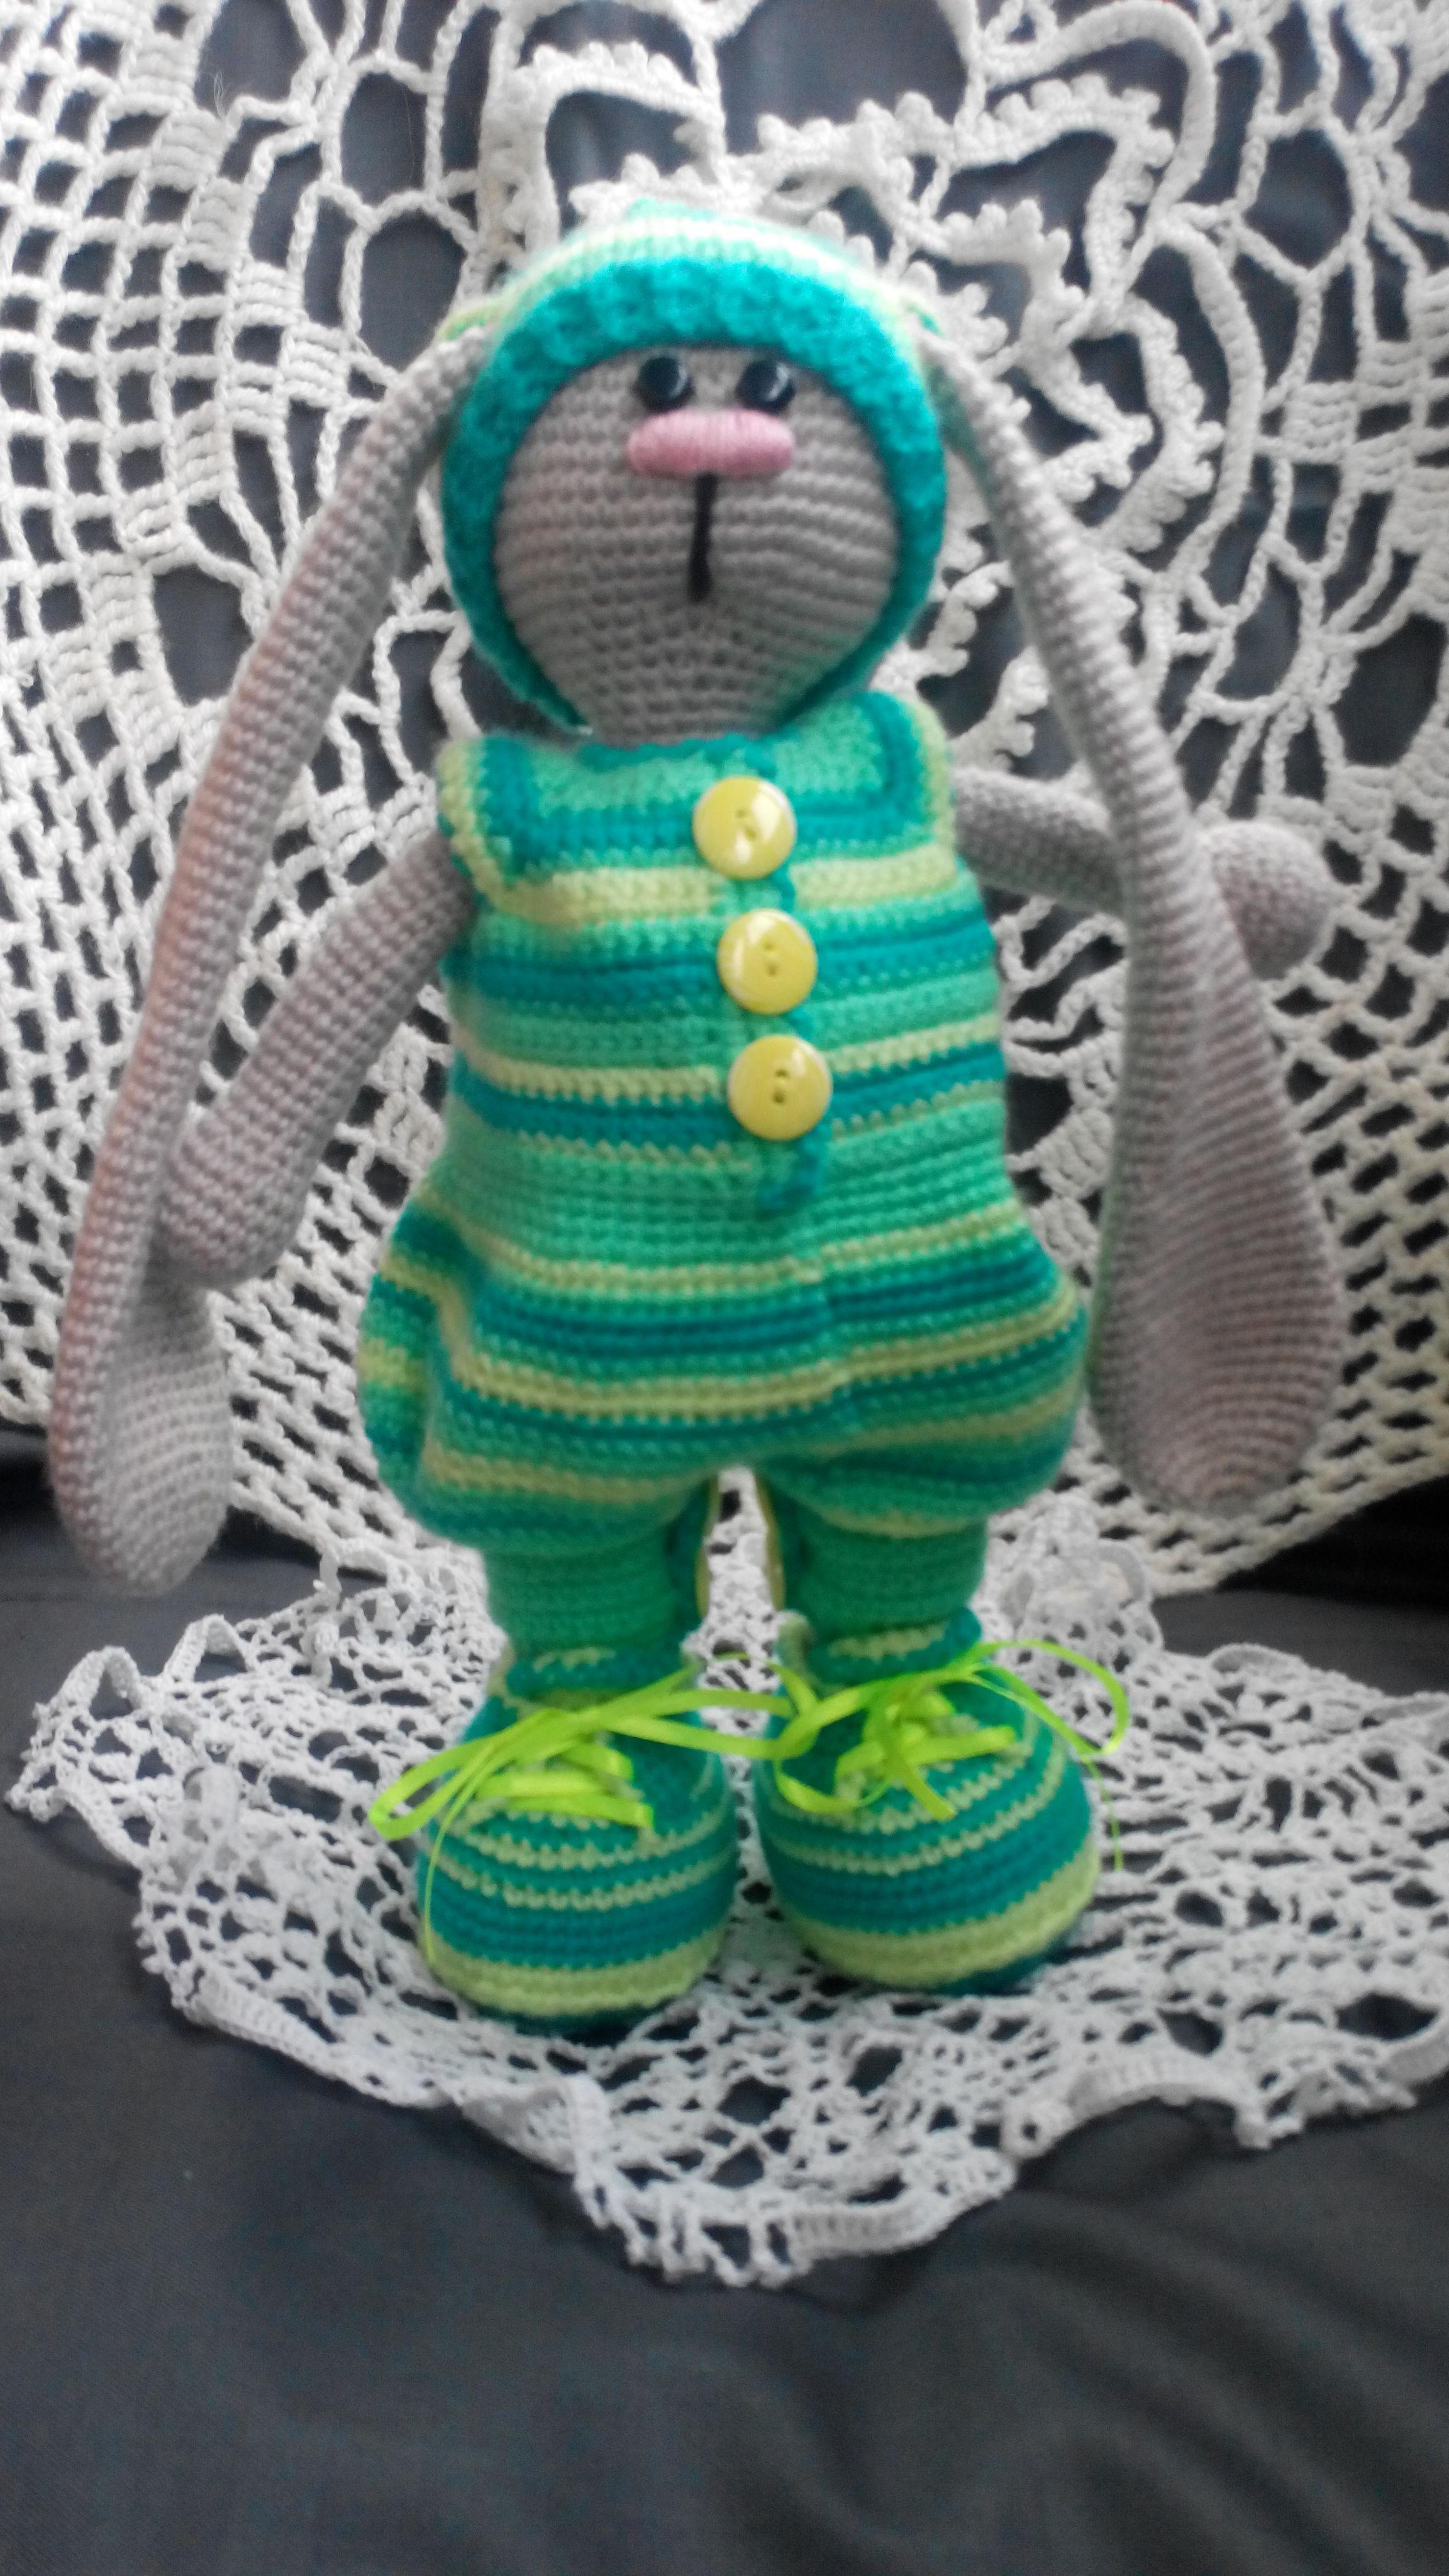 заяц handmade игрушки вязанные ручная работа вязанный